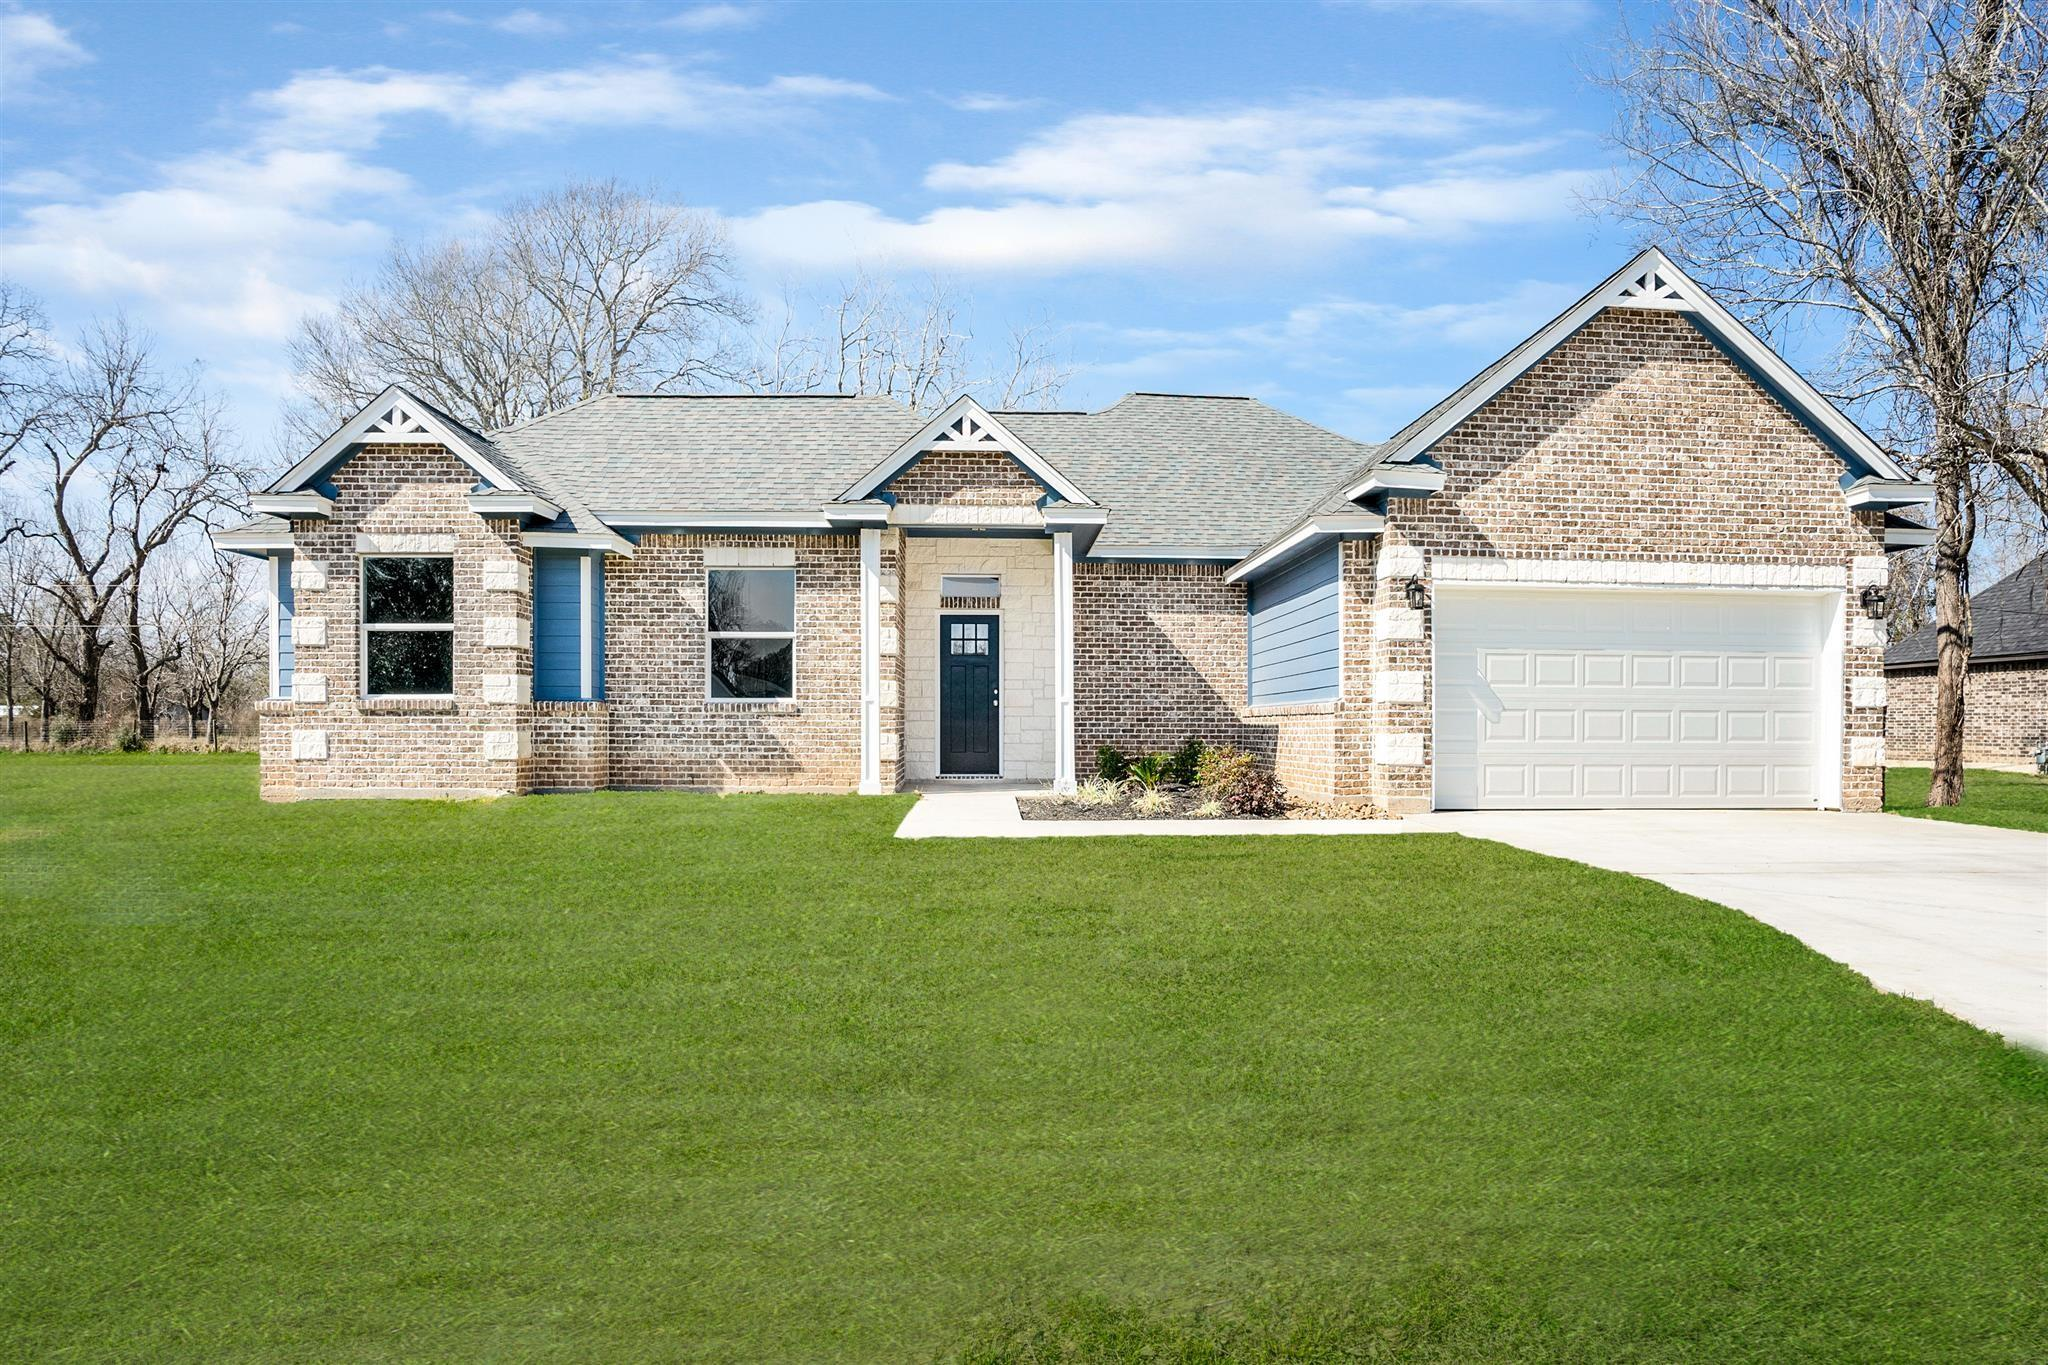 50 Ivy Court Property Photo - Jones Creek, TX real estate listing